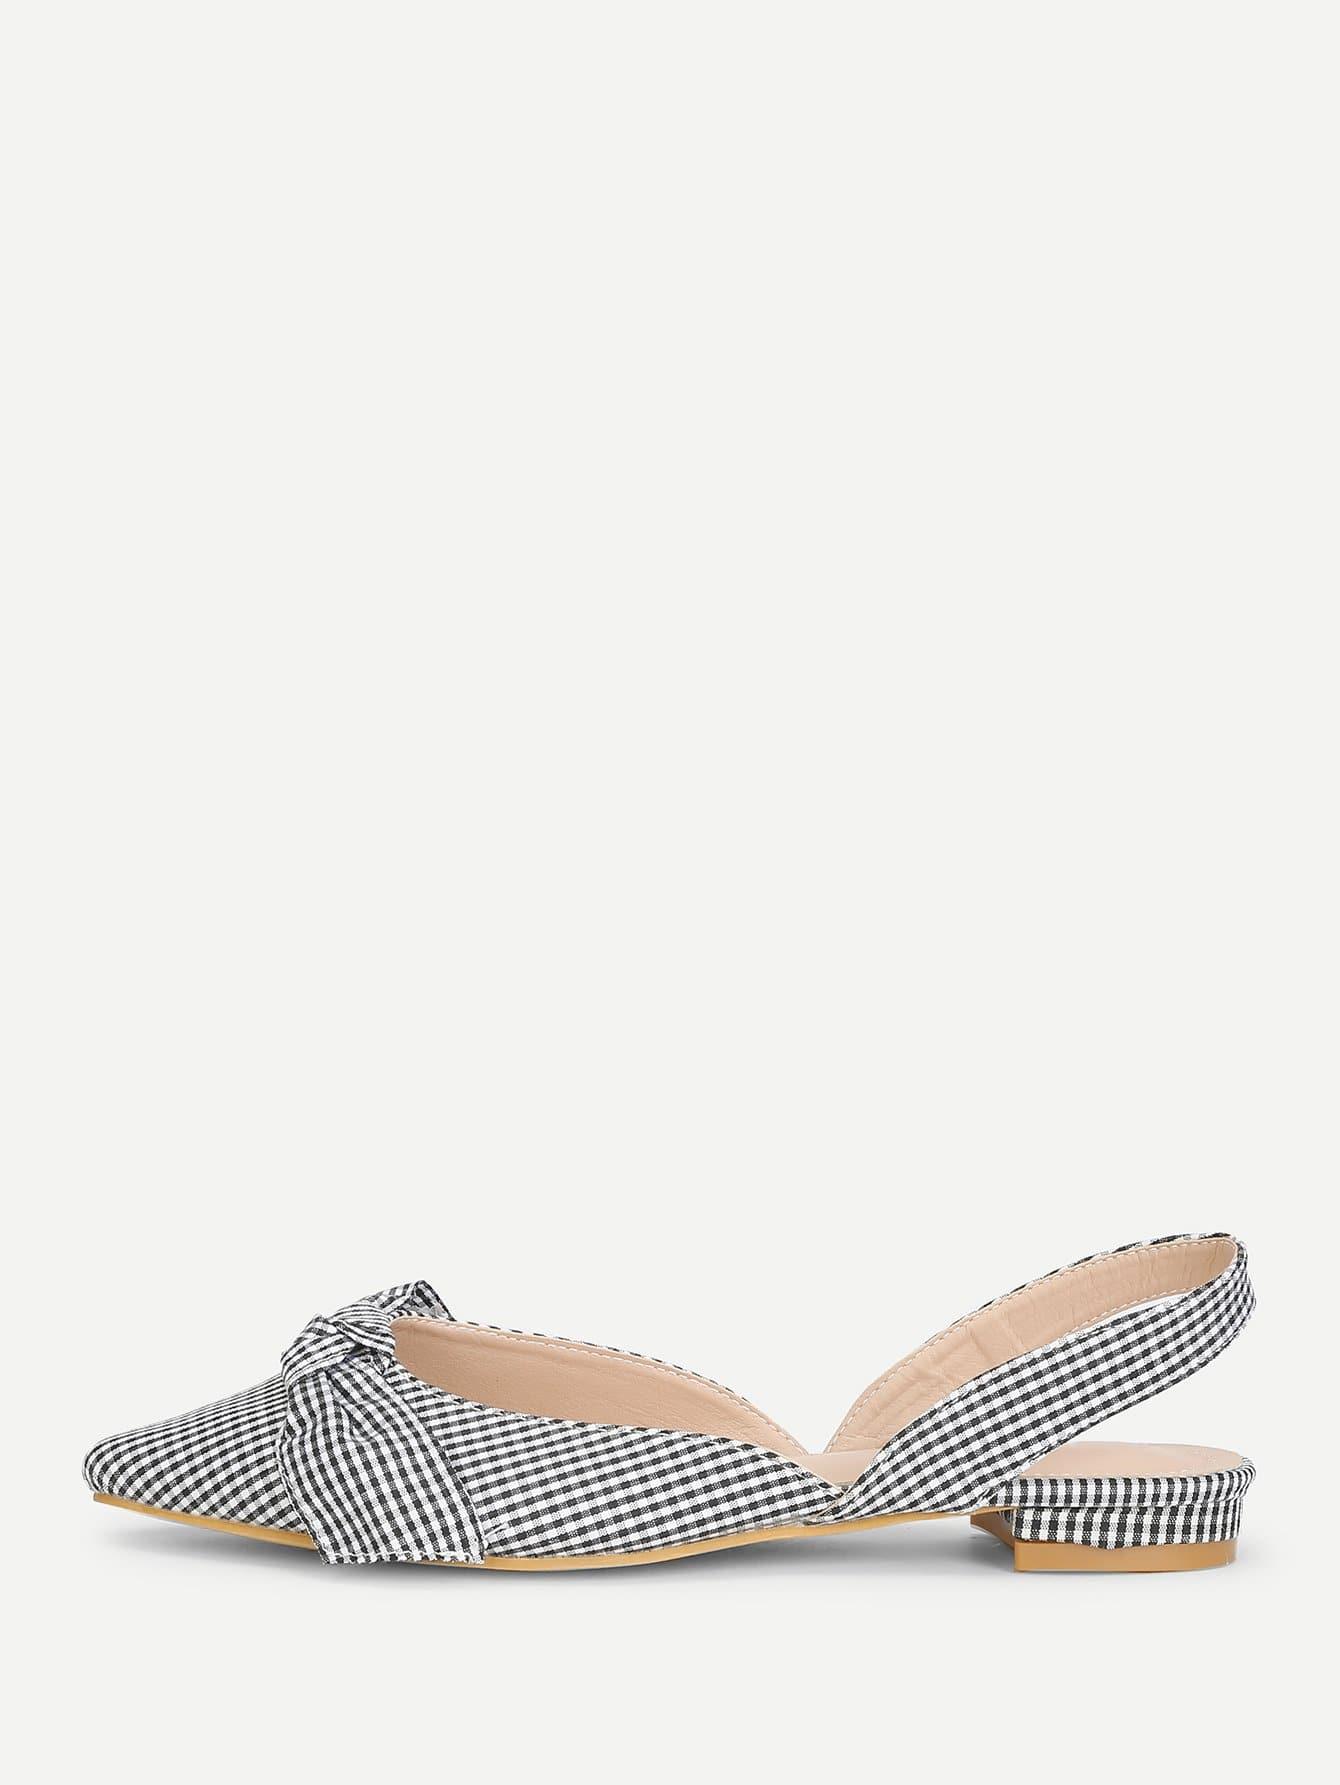 Gingham Print Pointed Toe Flats цена 2017